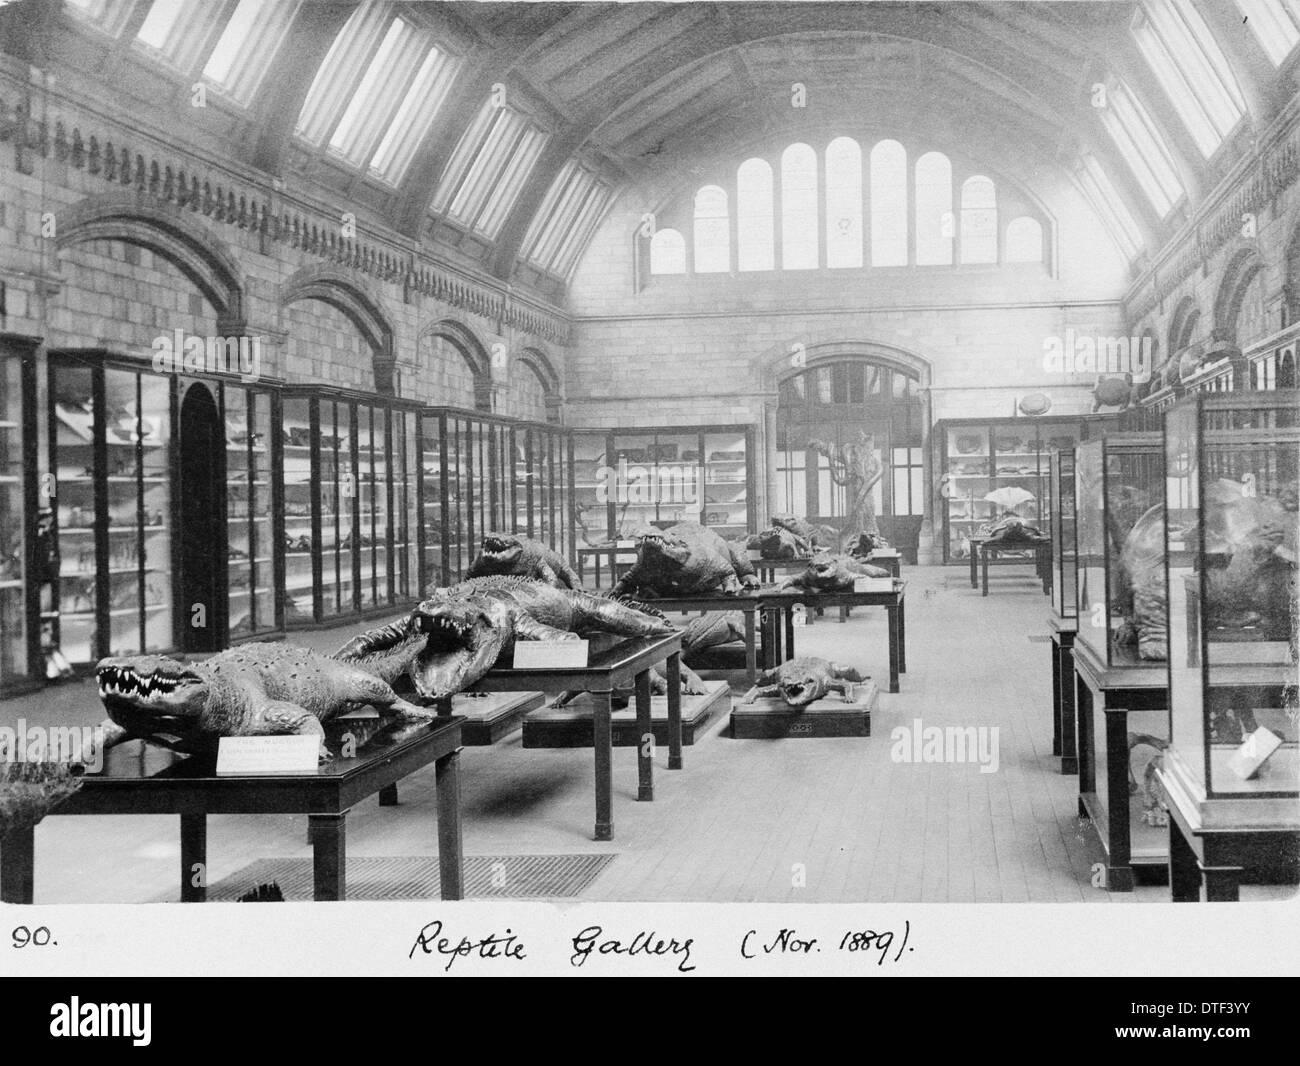 Reptile Gallery, November 1889 - Stock Image